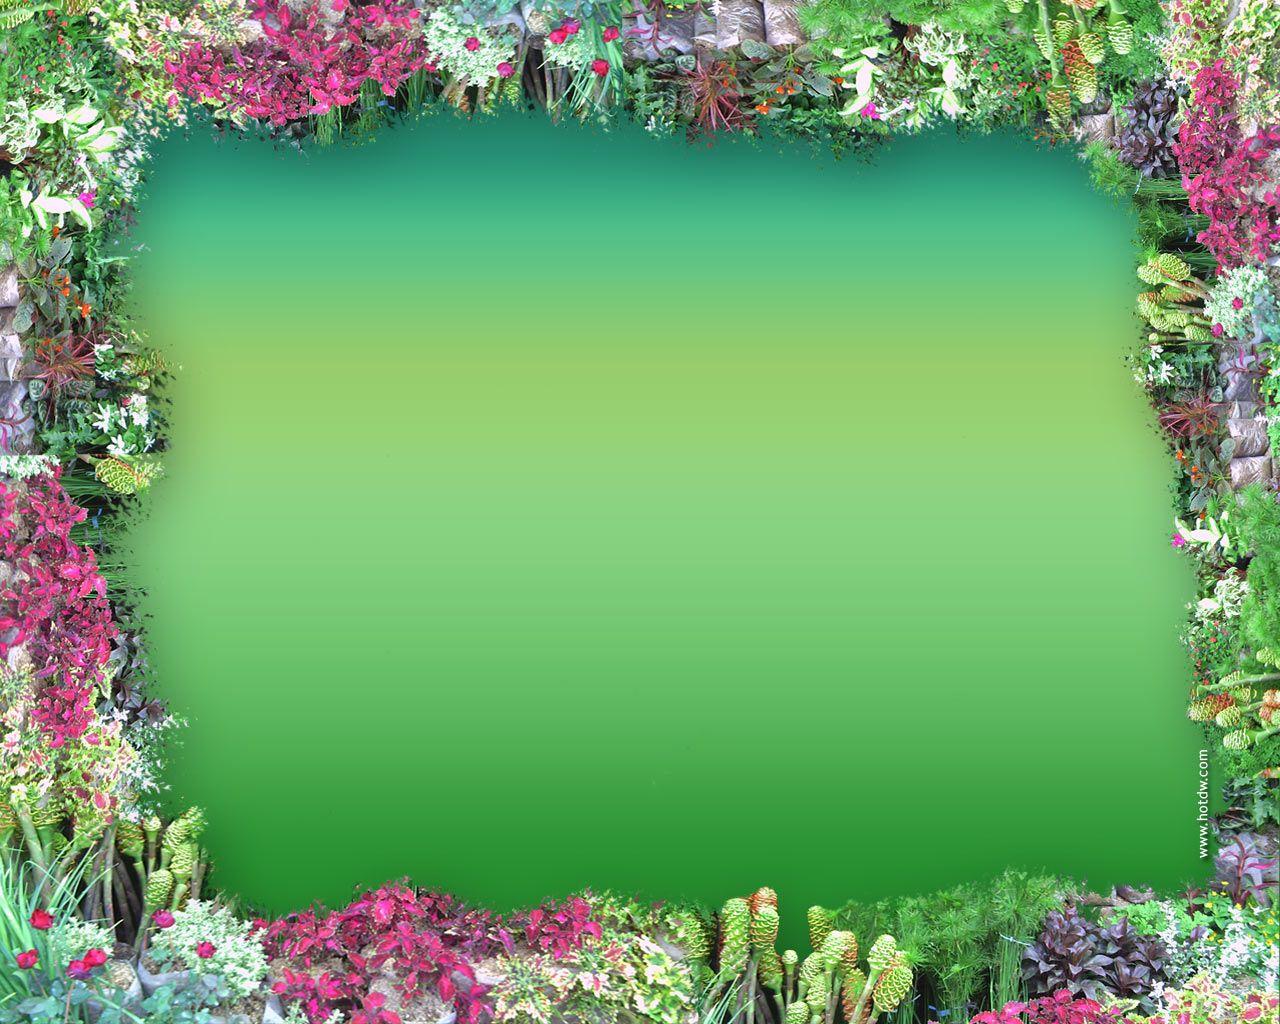 pretty frames for pictures online | Full Color Digital Frames - A ...